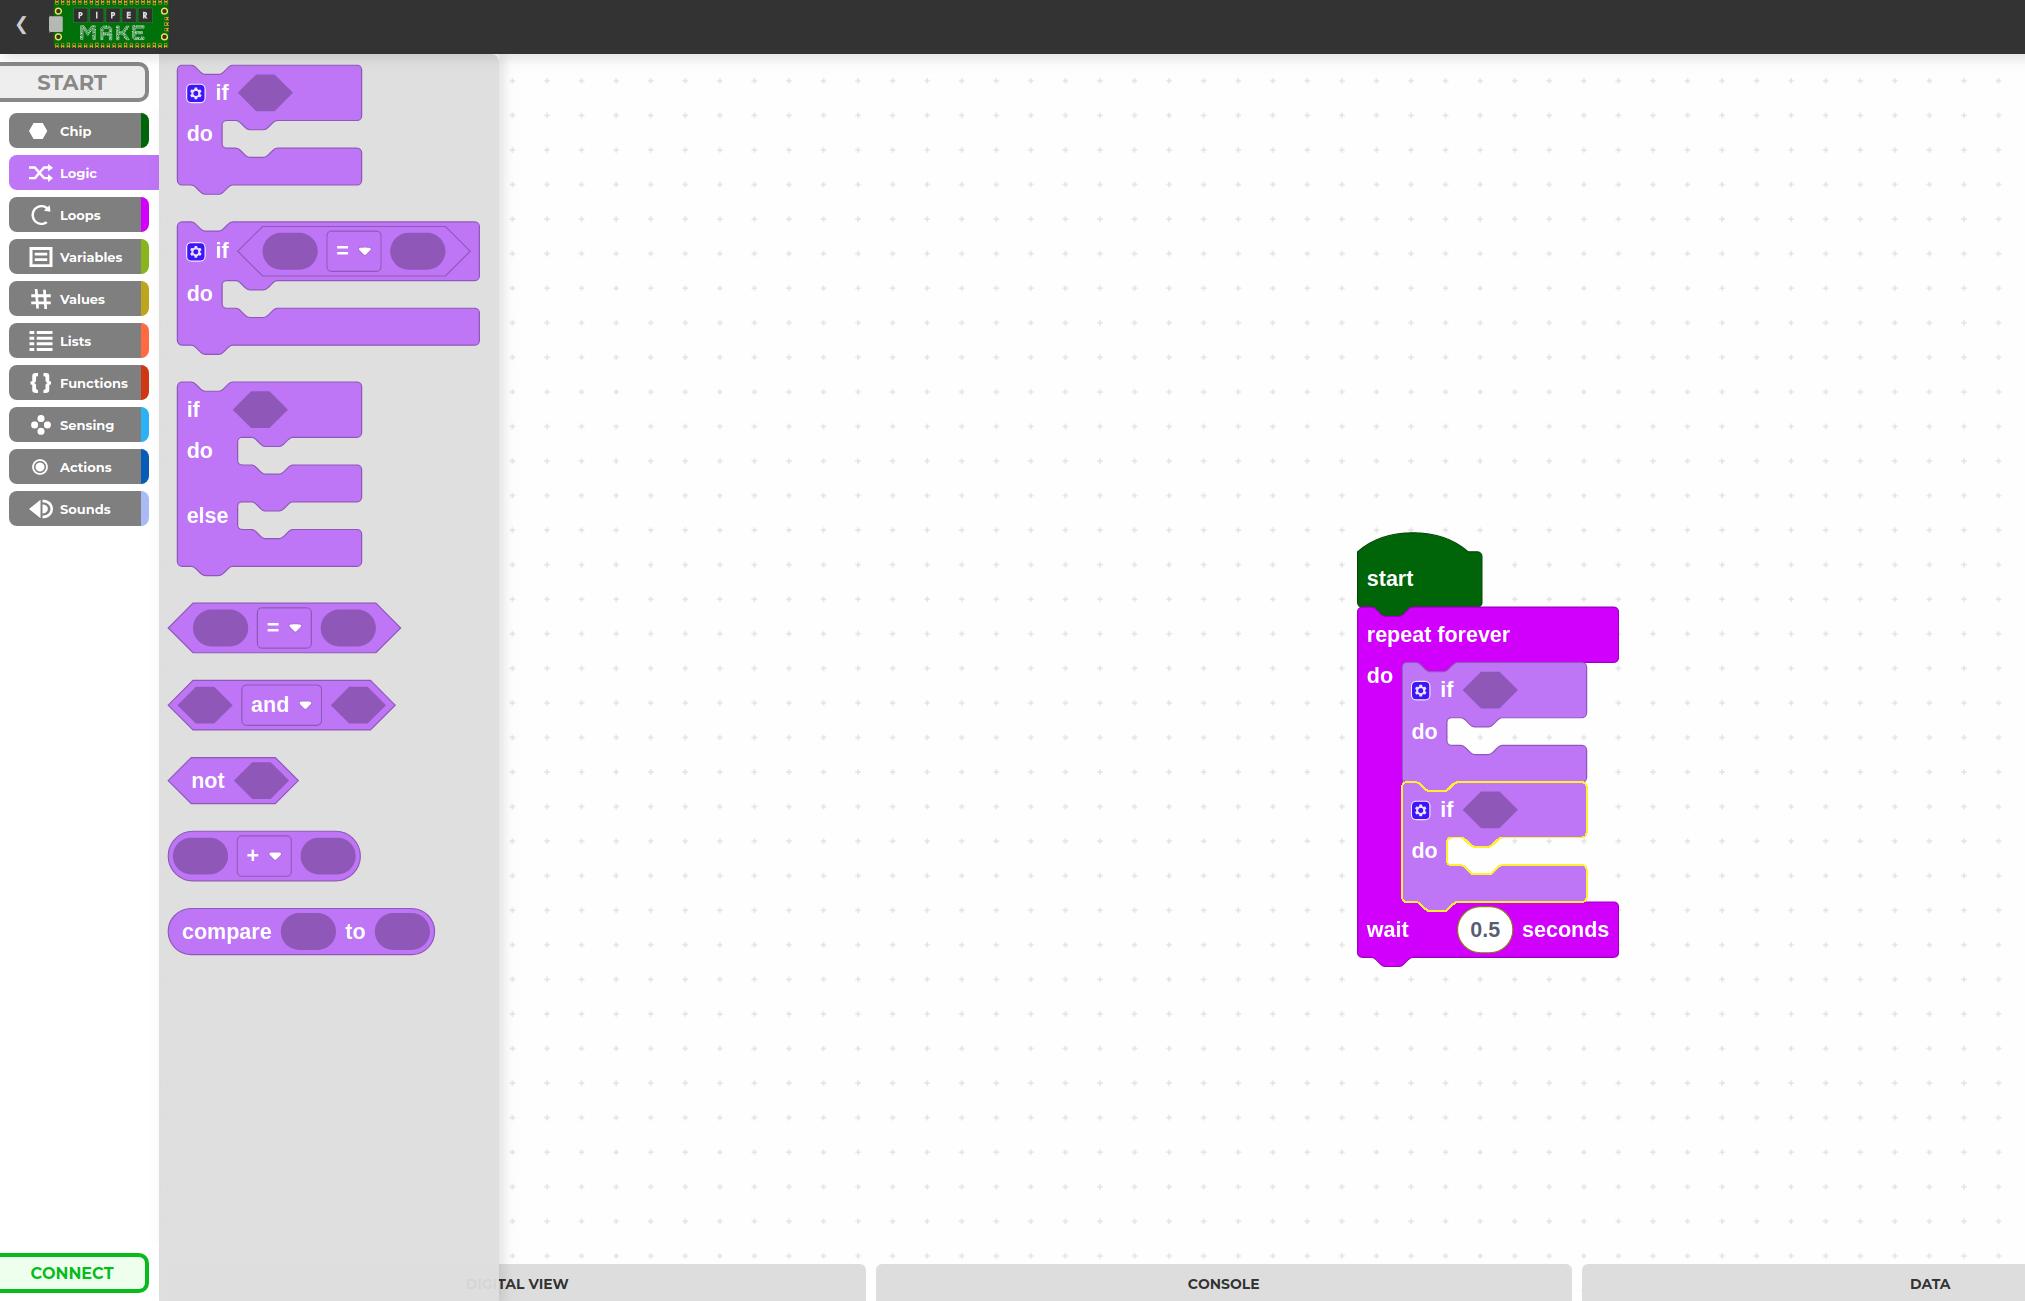 raspberry_pi_Screenshot_from_2021-03-24_16-43-22.png